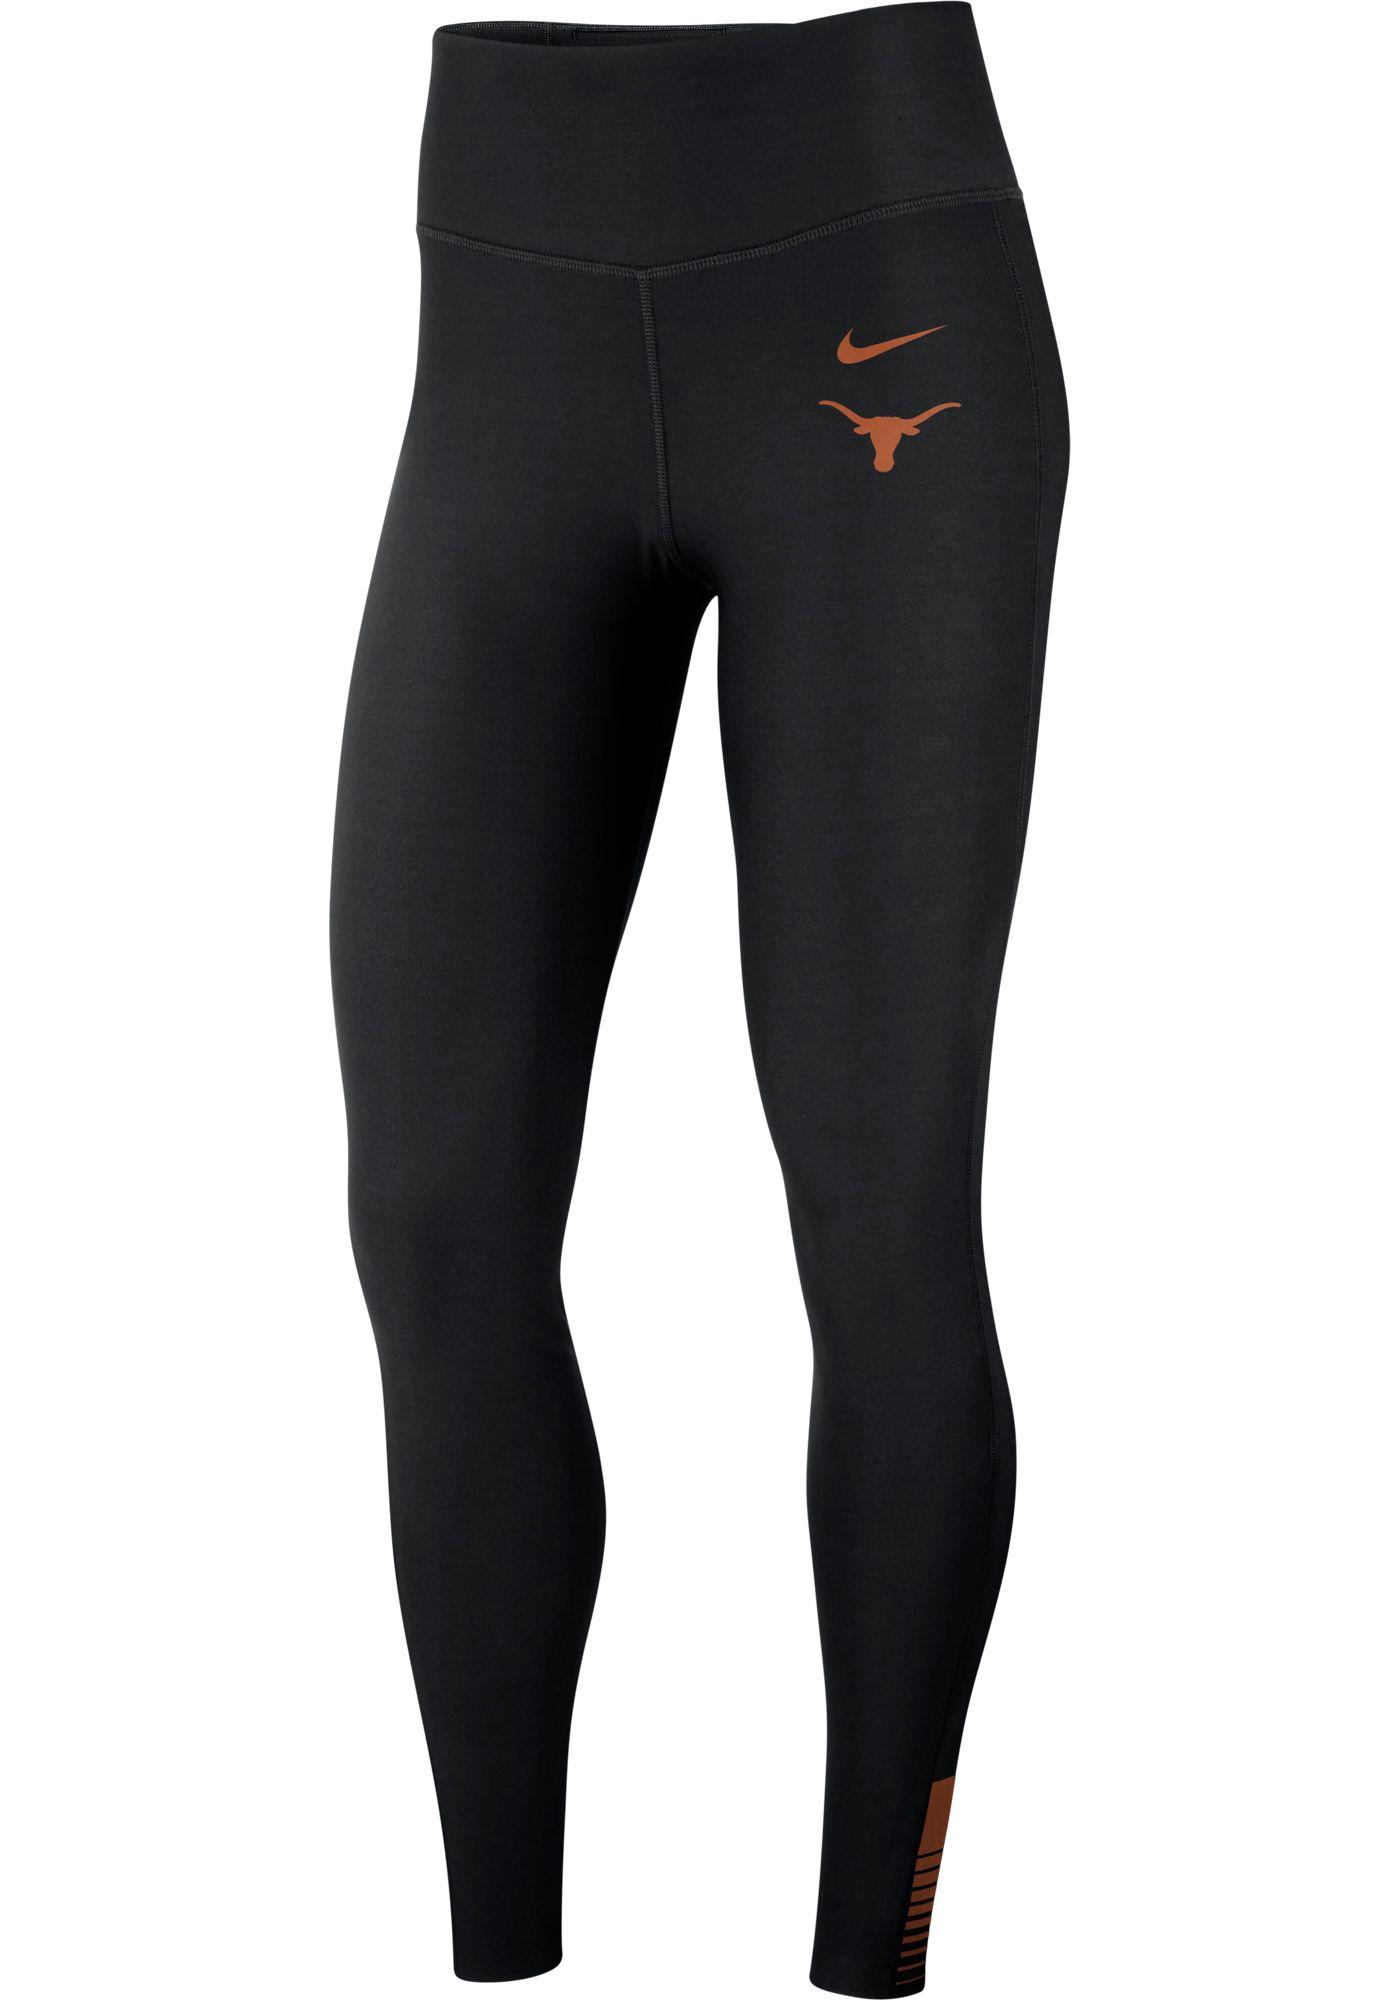 Nike Women's Texas Longhorns Power Sculpt High Rise Training Black Tights